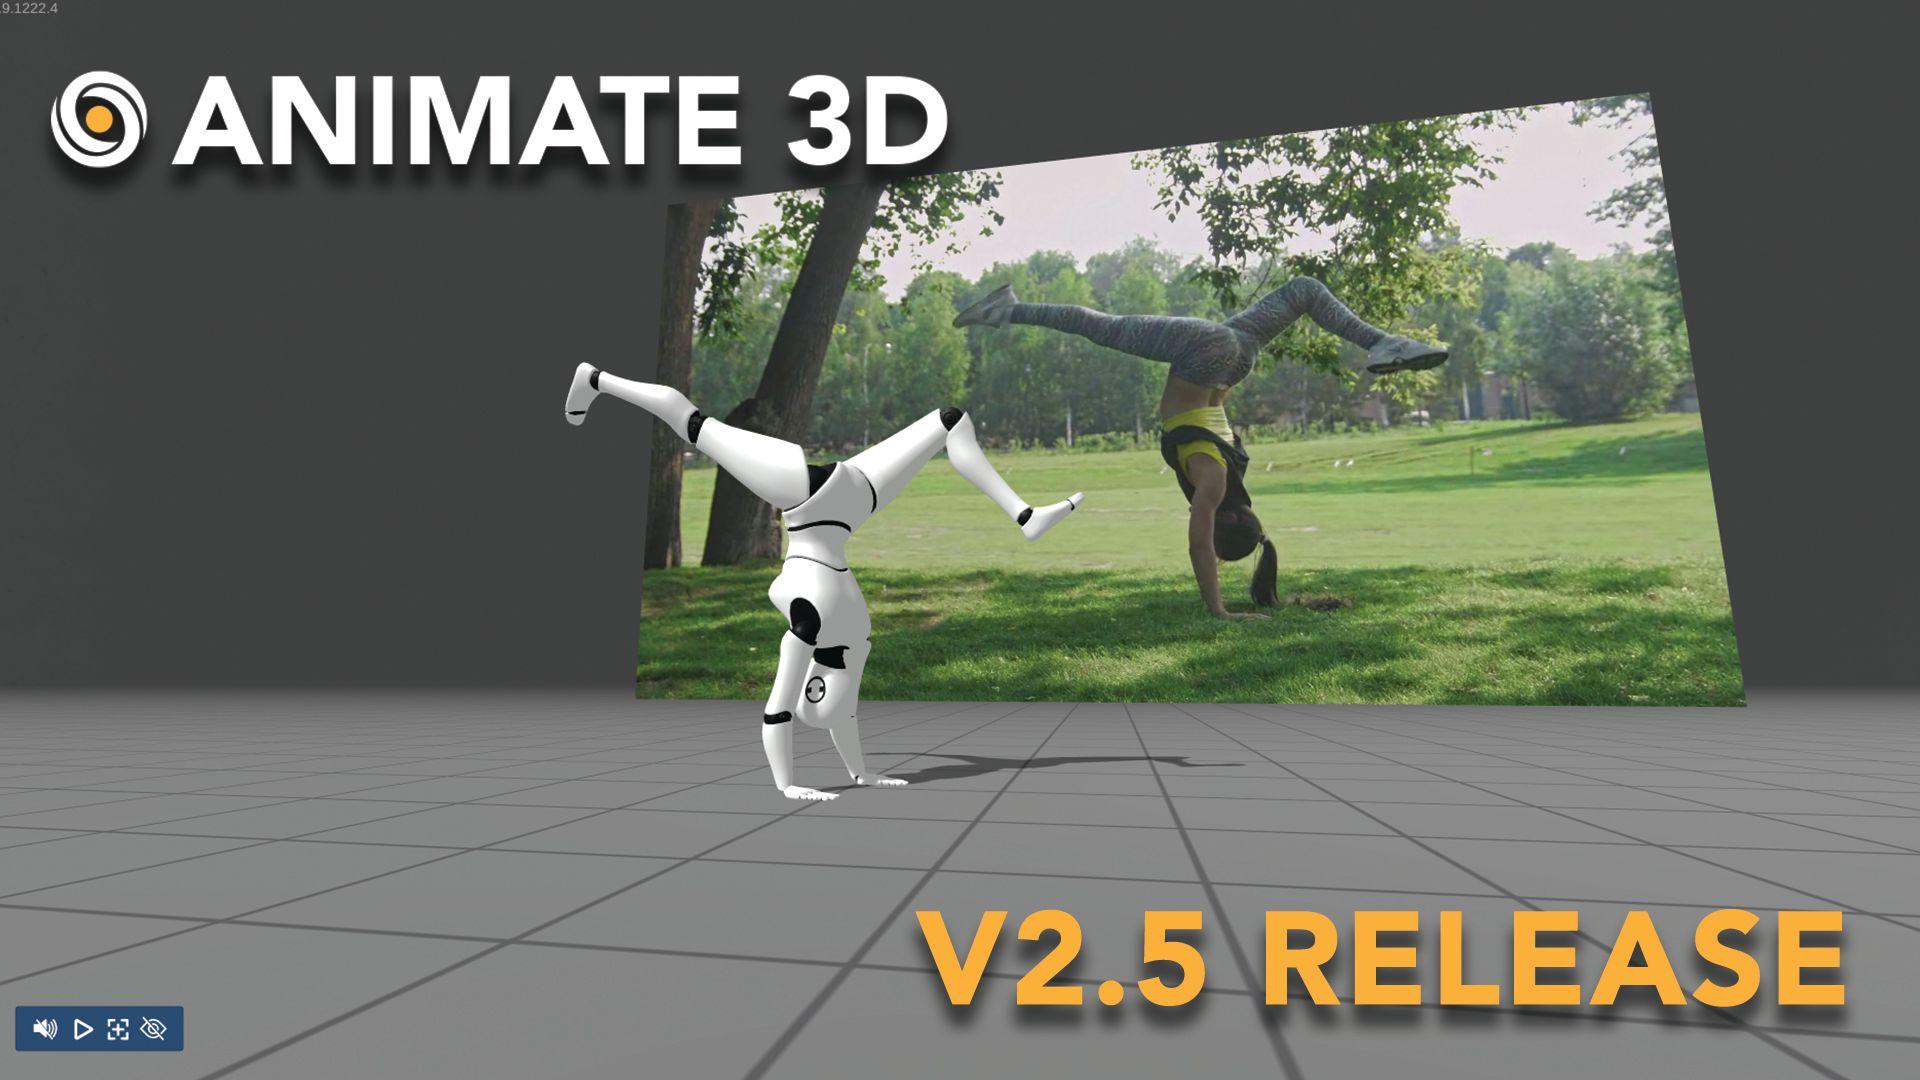 Animate 3D - V2.5 Release